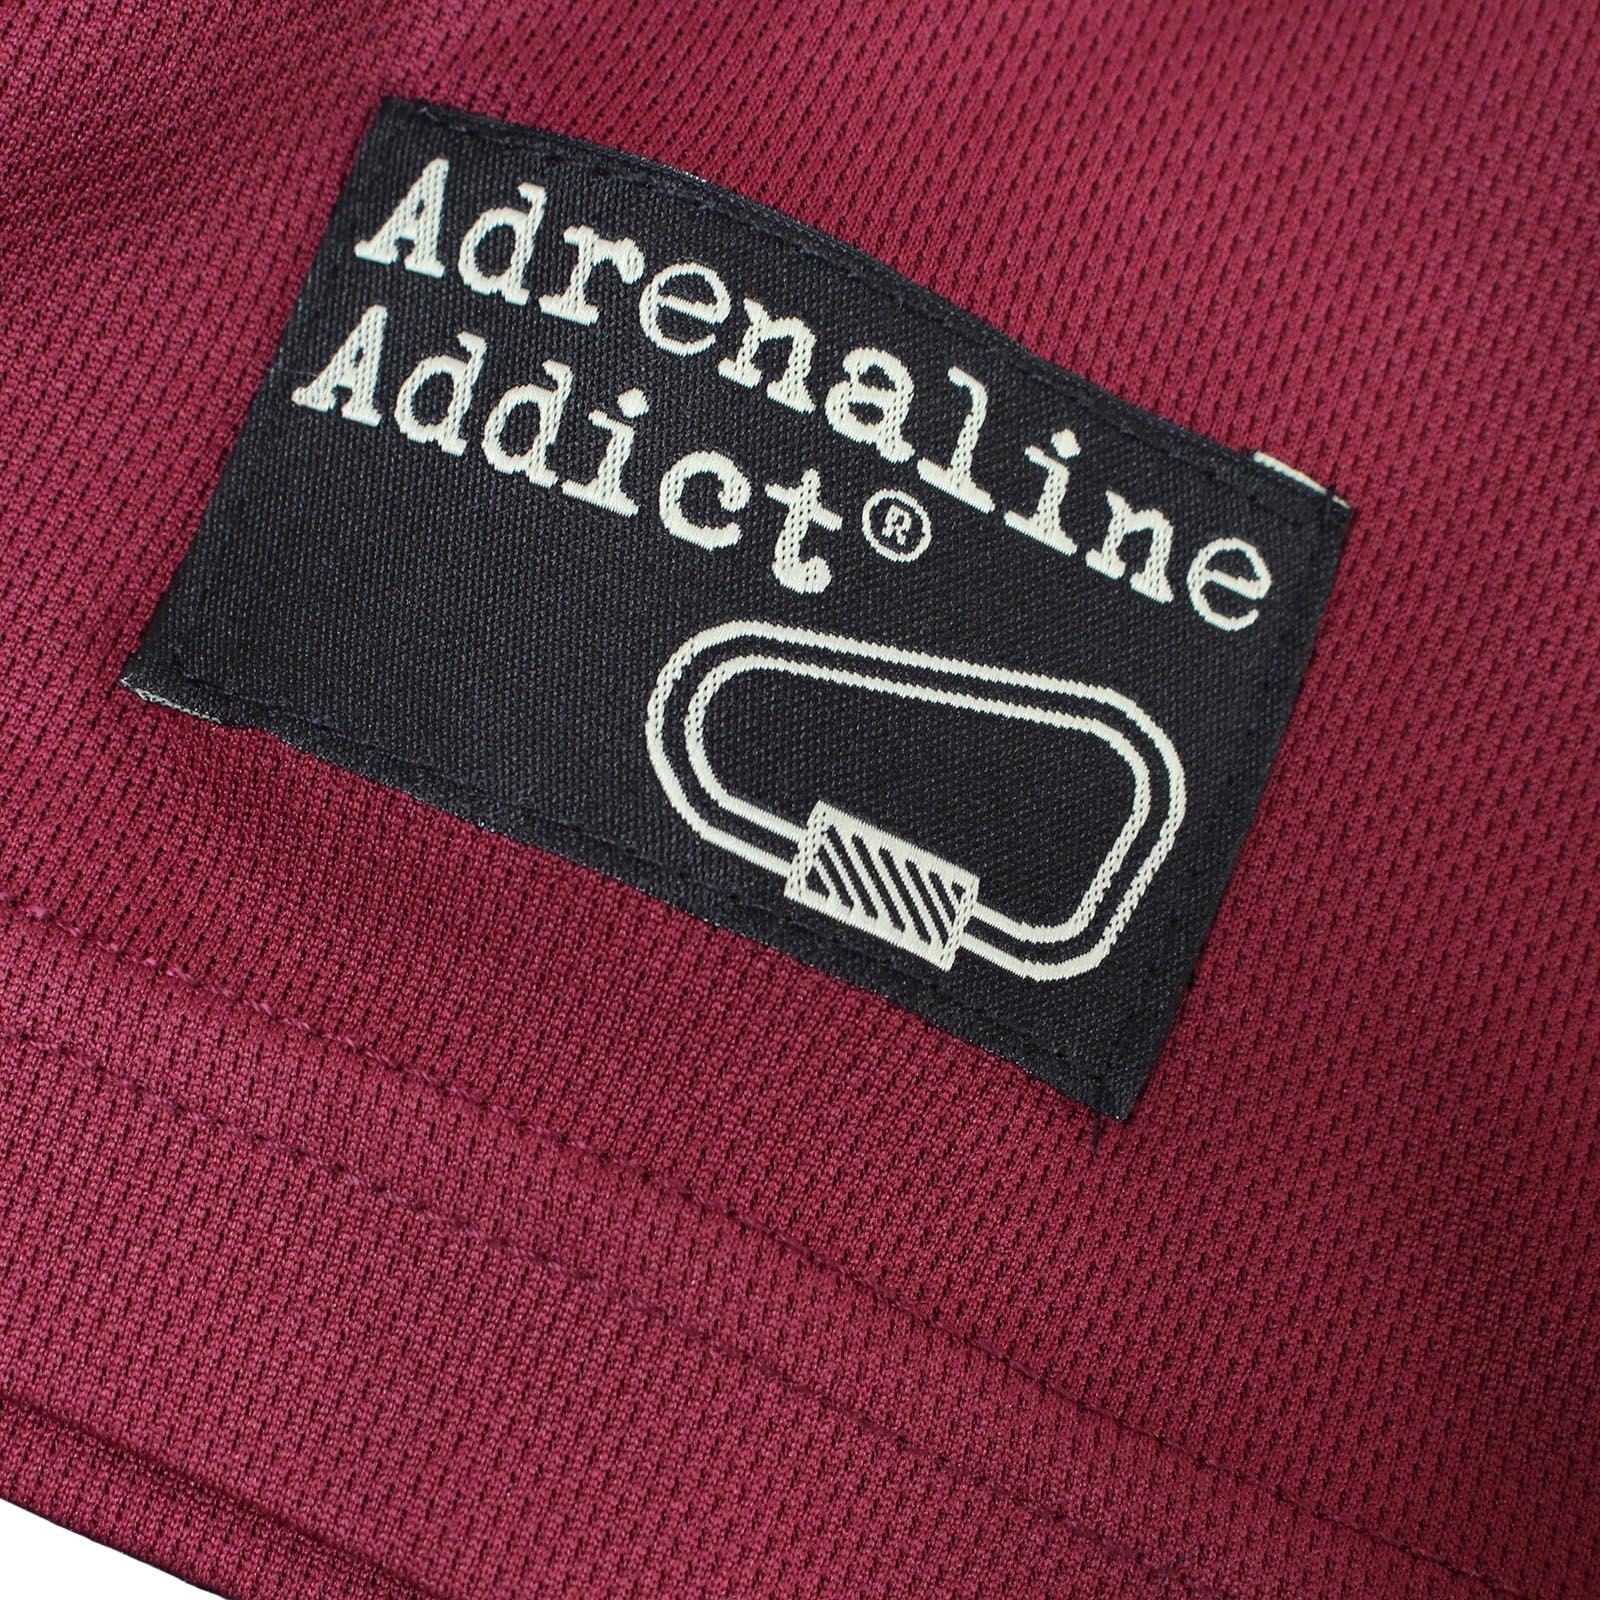 Eat Sleep Climb Premium Dry Fit Breathable Sports T-SHIRT Adrenaline Addict